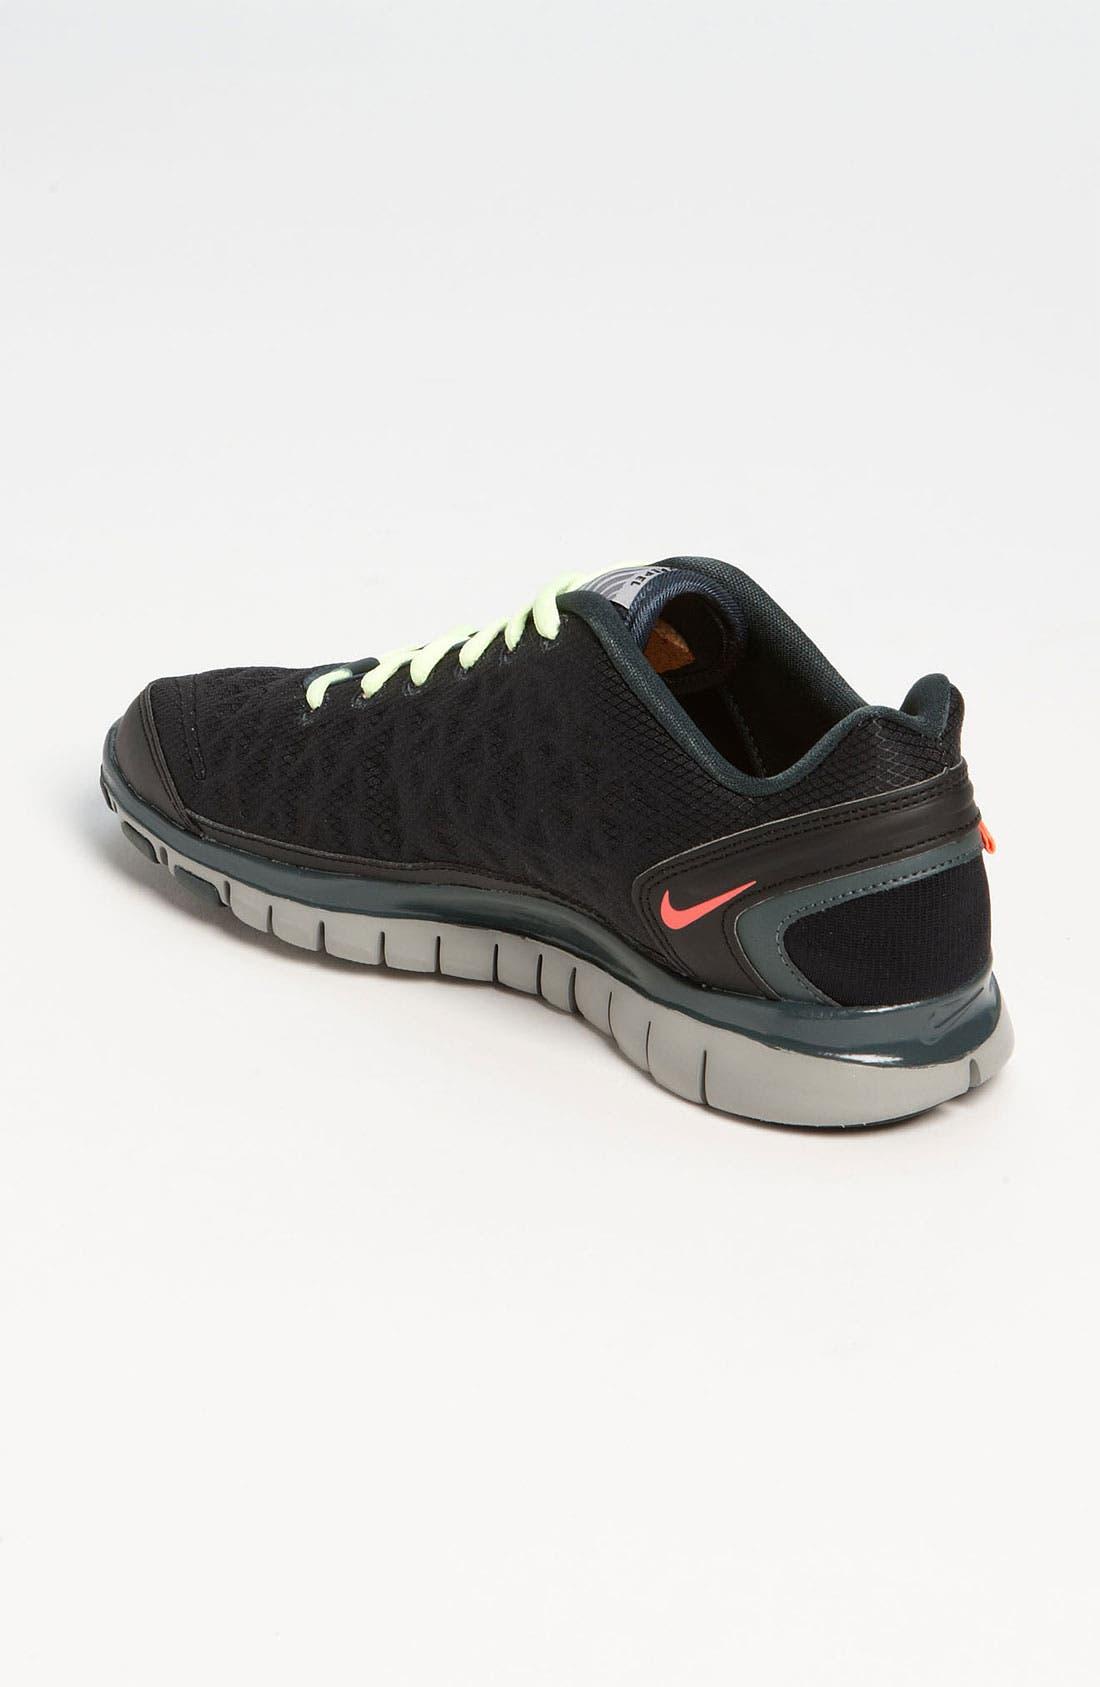 Alternate Image 2  - Nike 'Free TR Fit 2 Shield' Training Shoe (Women)